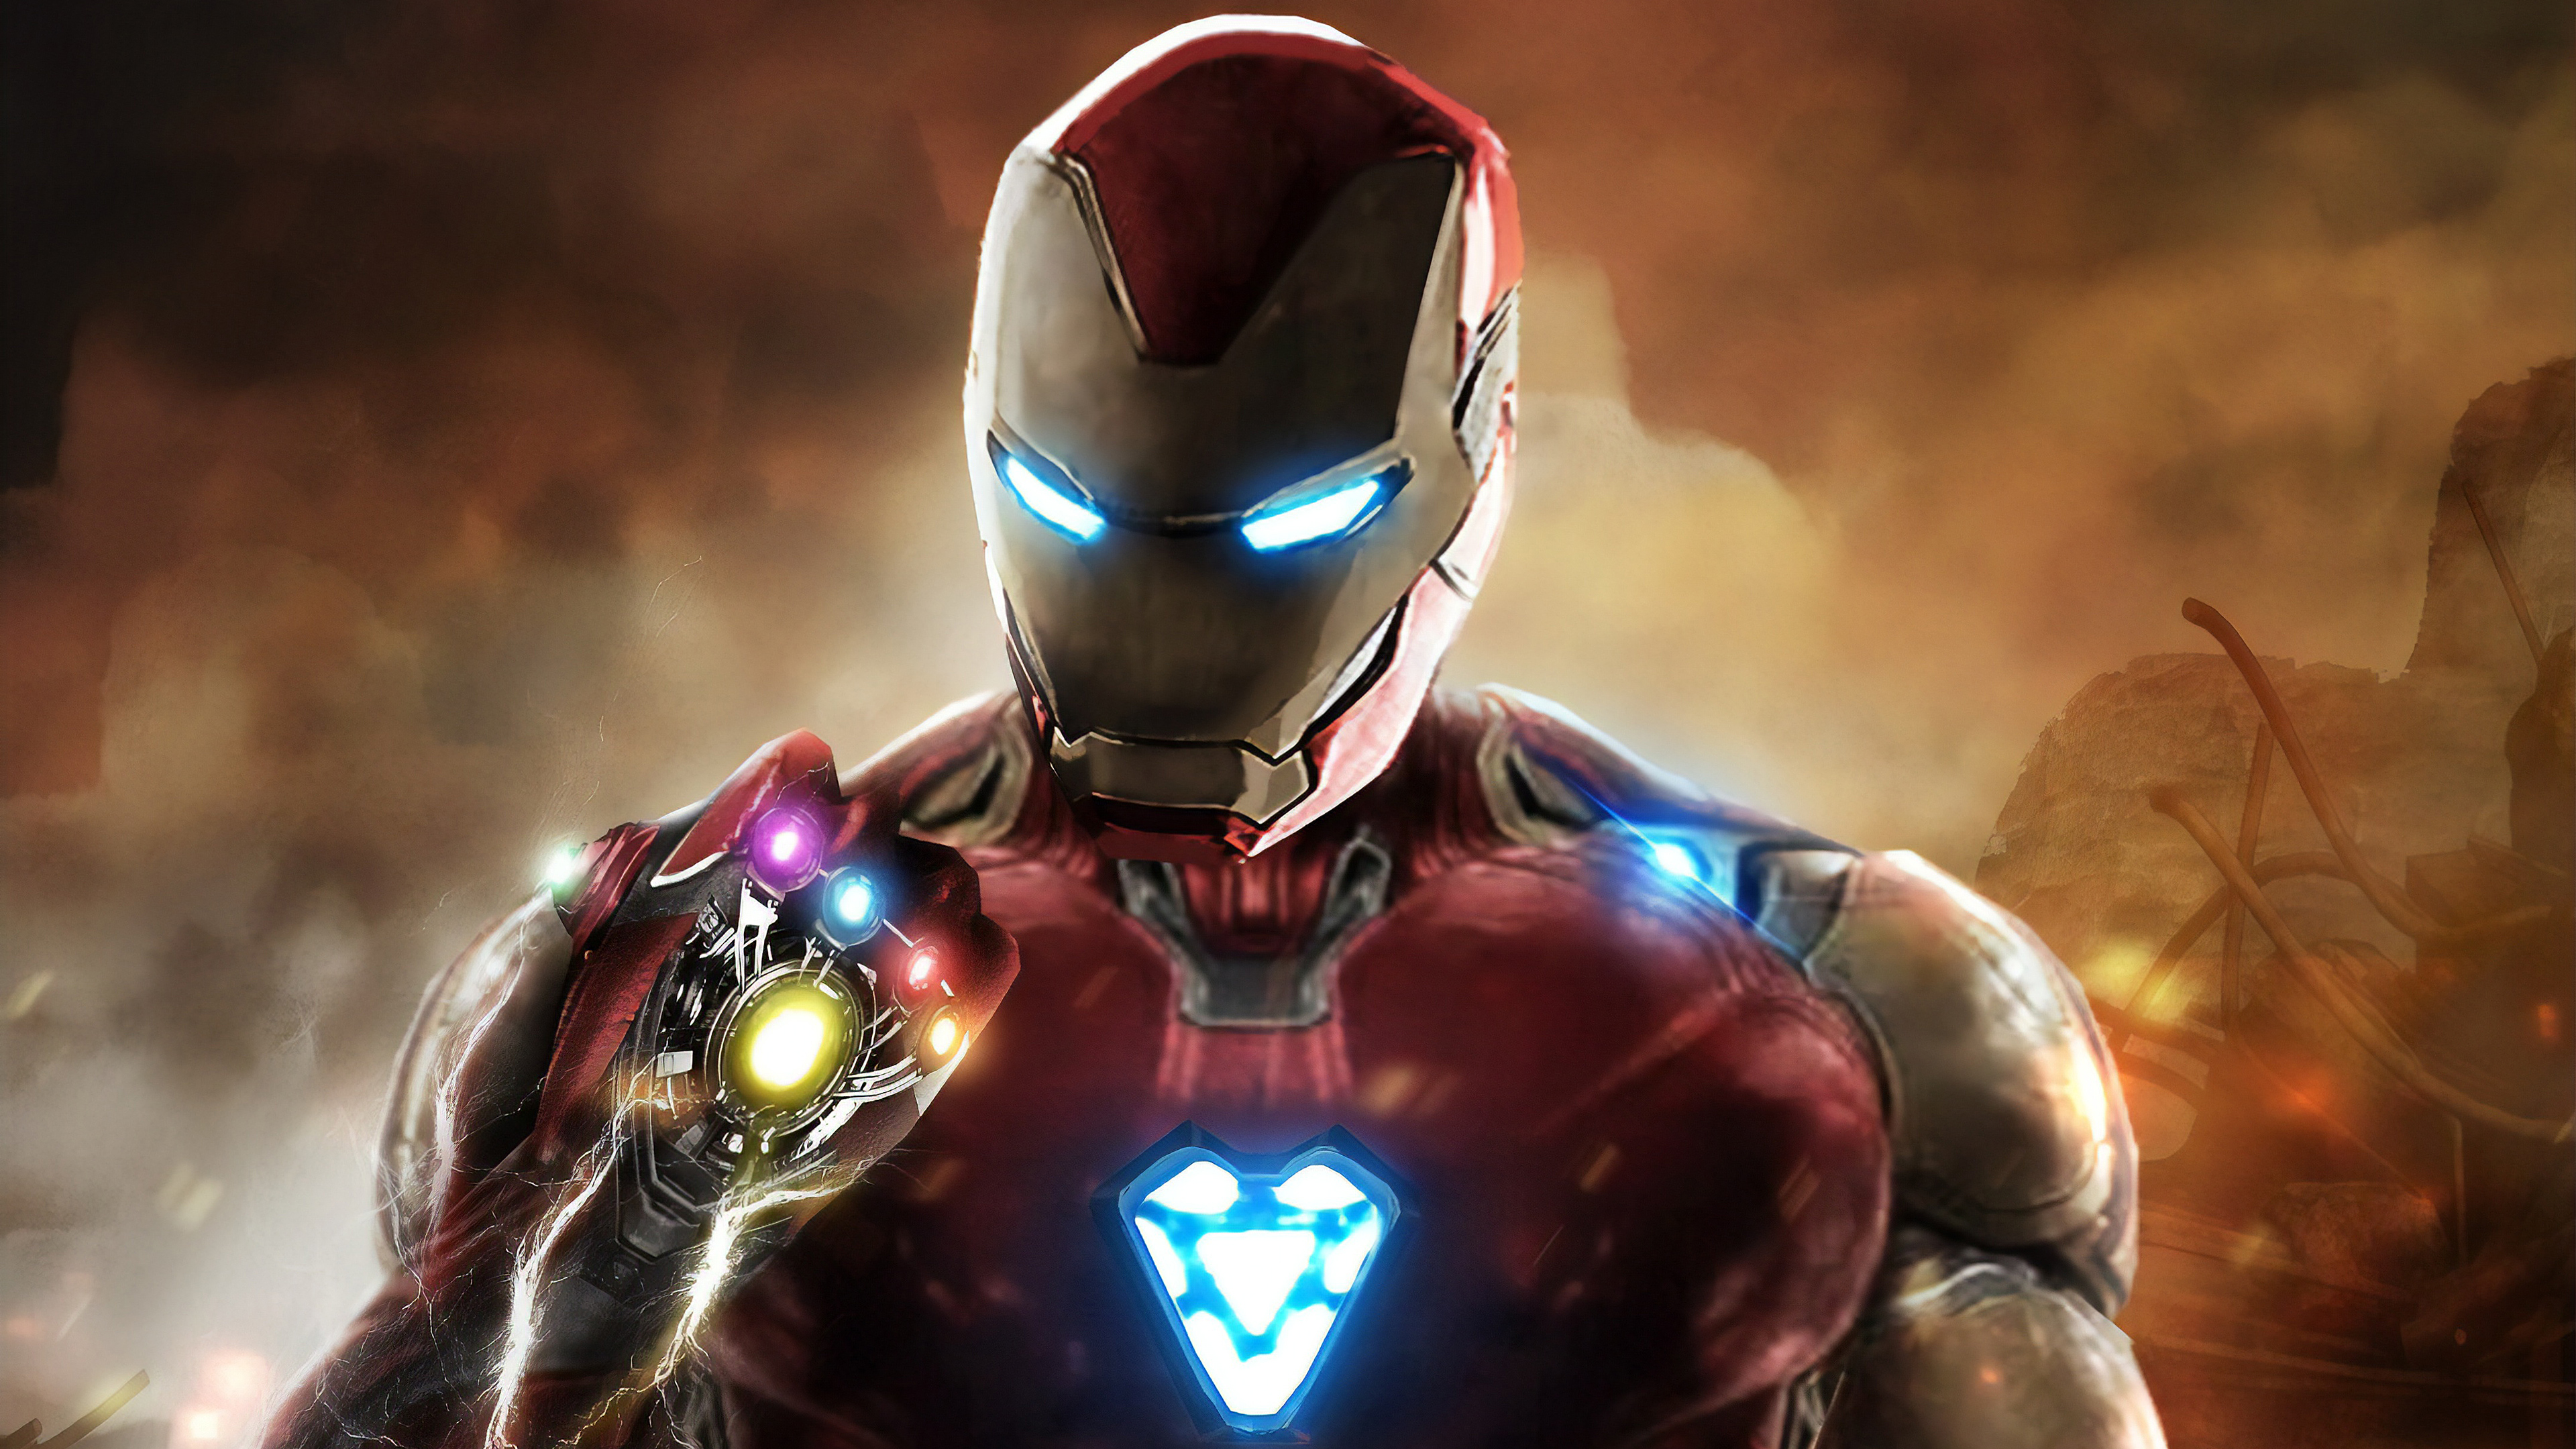 Iron Man Infinity Gauntlet Avengers Endgame Hd Superheroes 4k